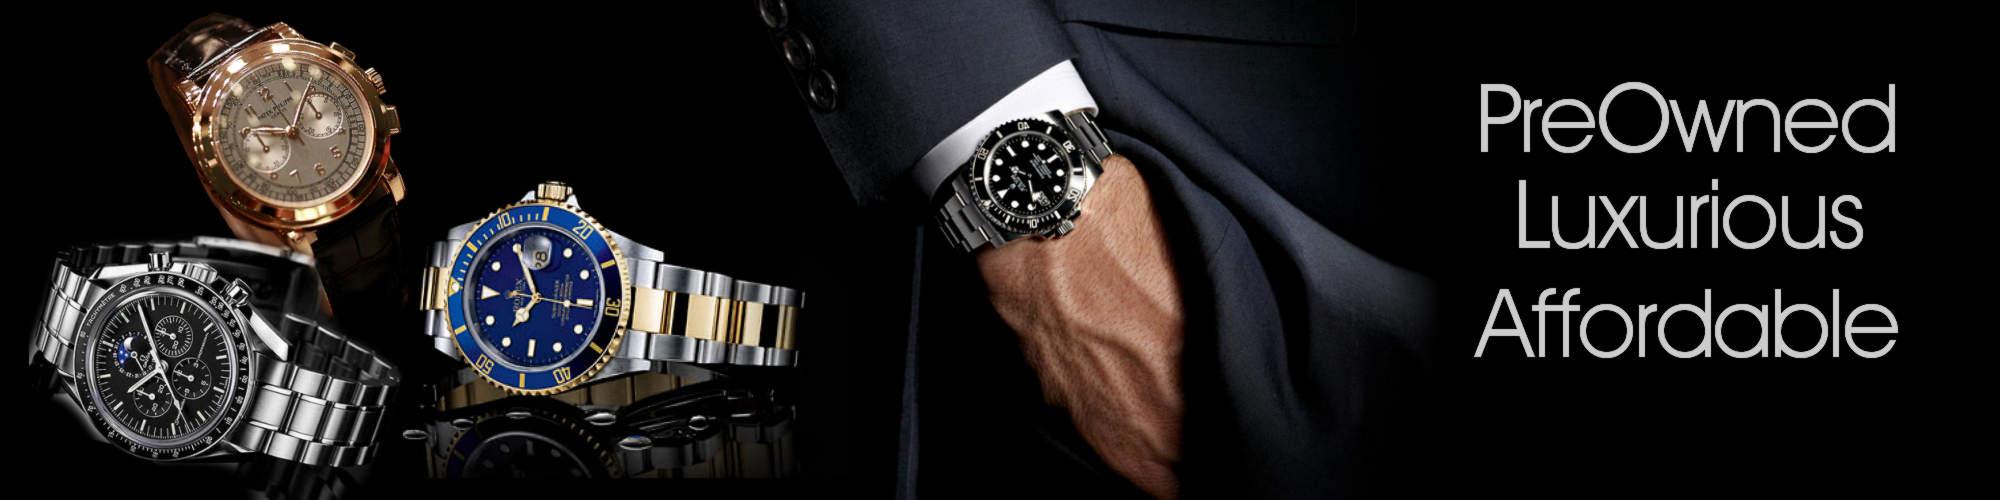 Sell Rolex Los Angeles - Gemandloan